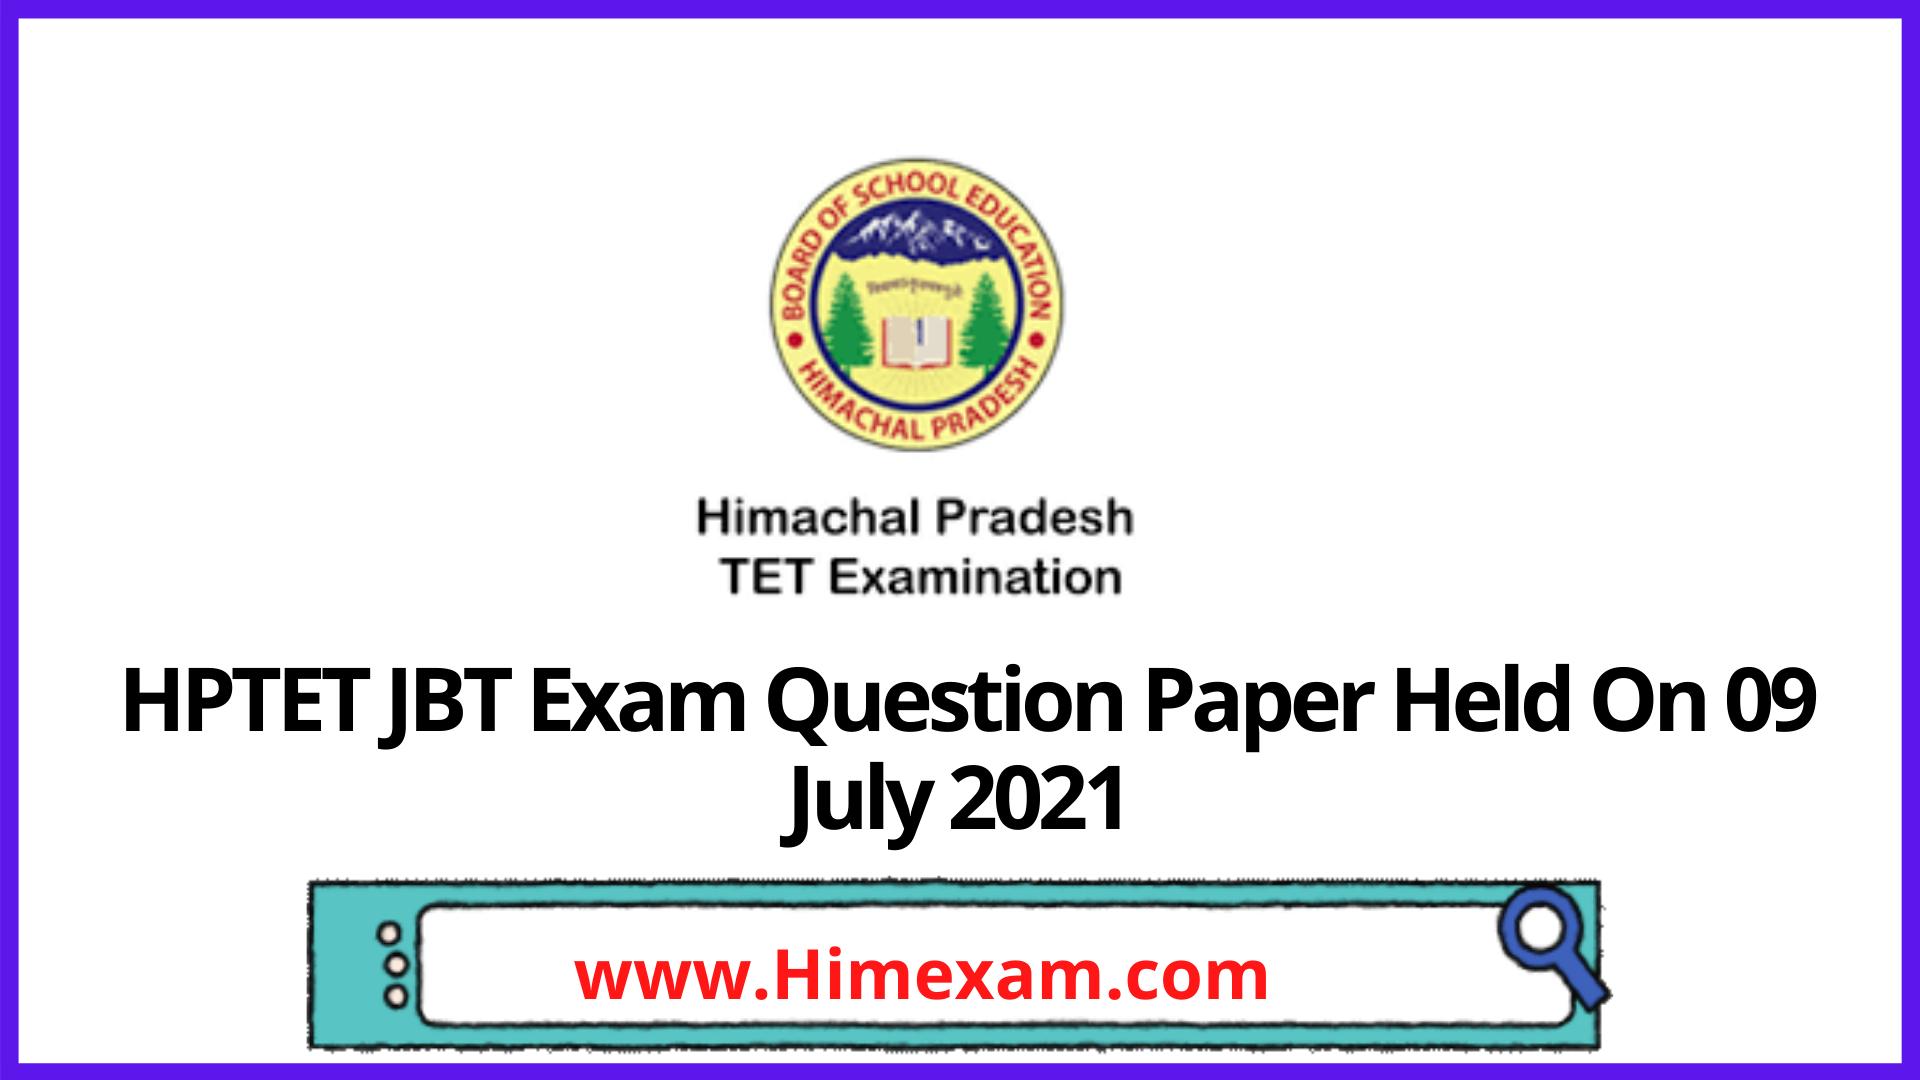 HPTET JBT Exam Question Paper Held On 09 July 2021